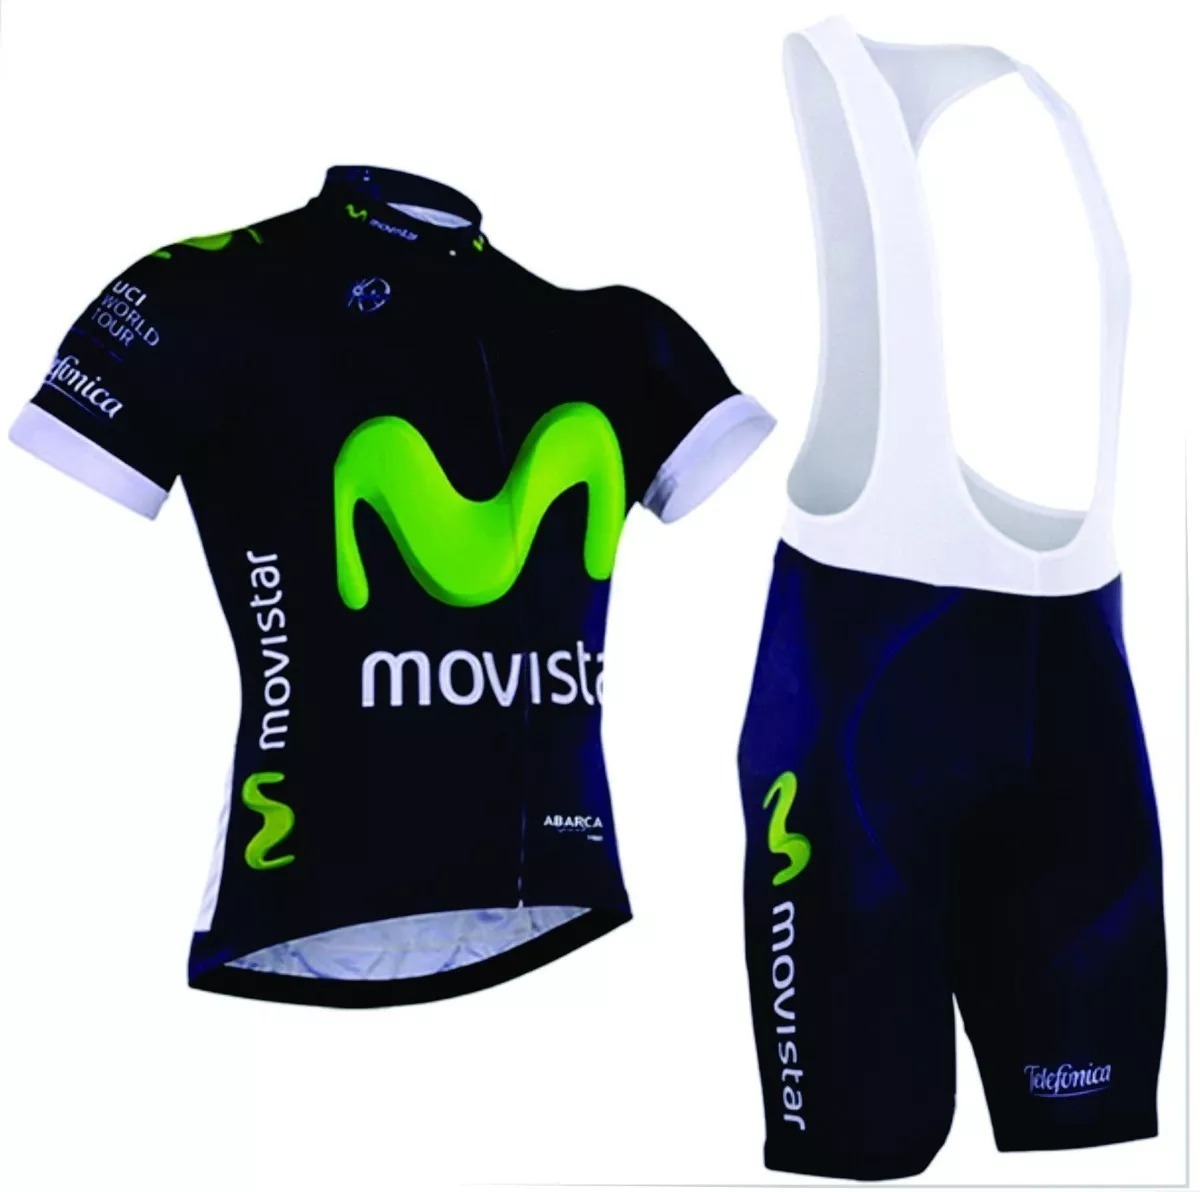 54450f5ffb uniforme corto ciclista manga corta mtb ruta gel + envió gra. Cargando zoom.